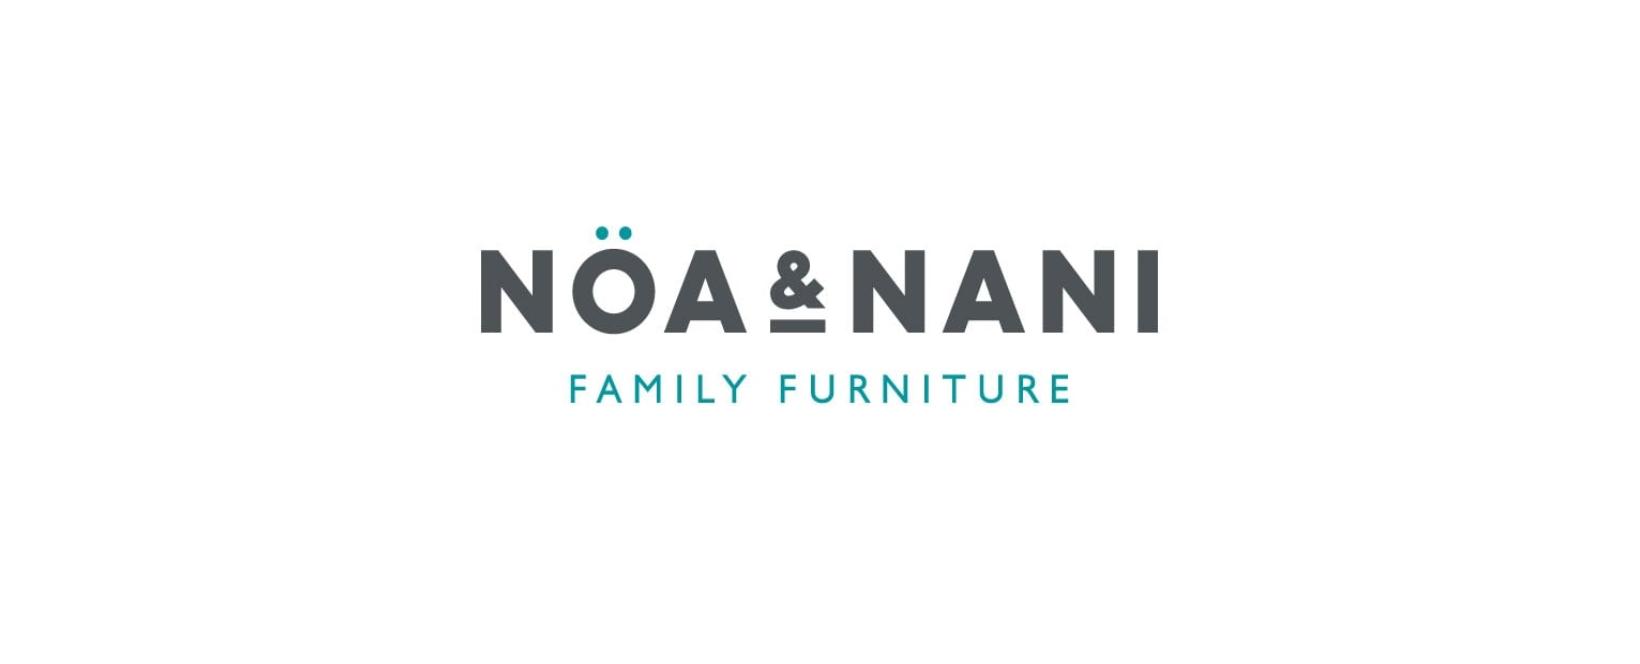 Noa And Nani UK Discount Code 2021